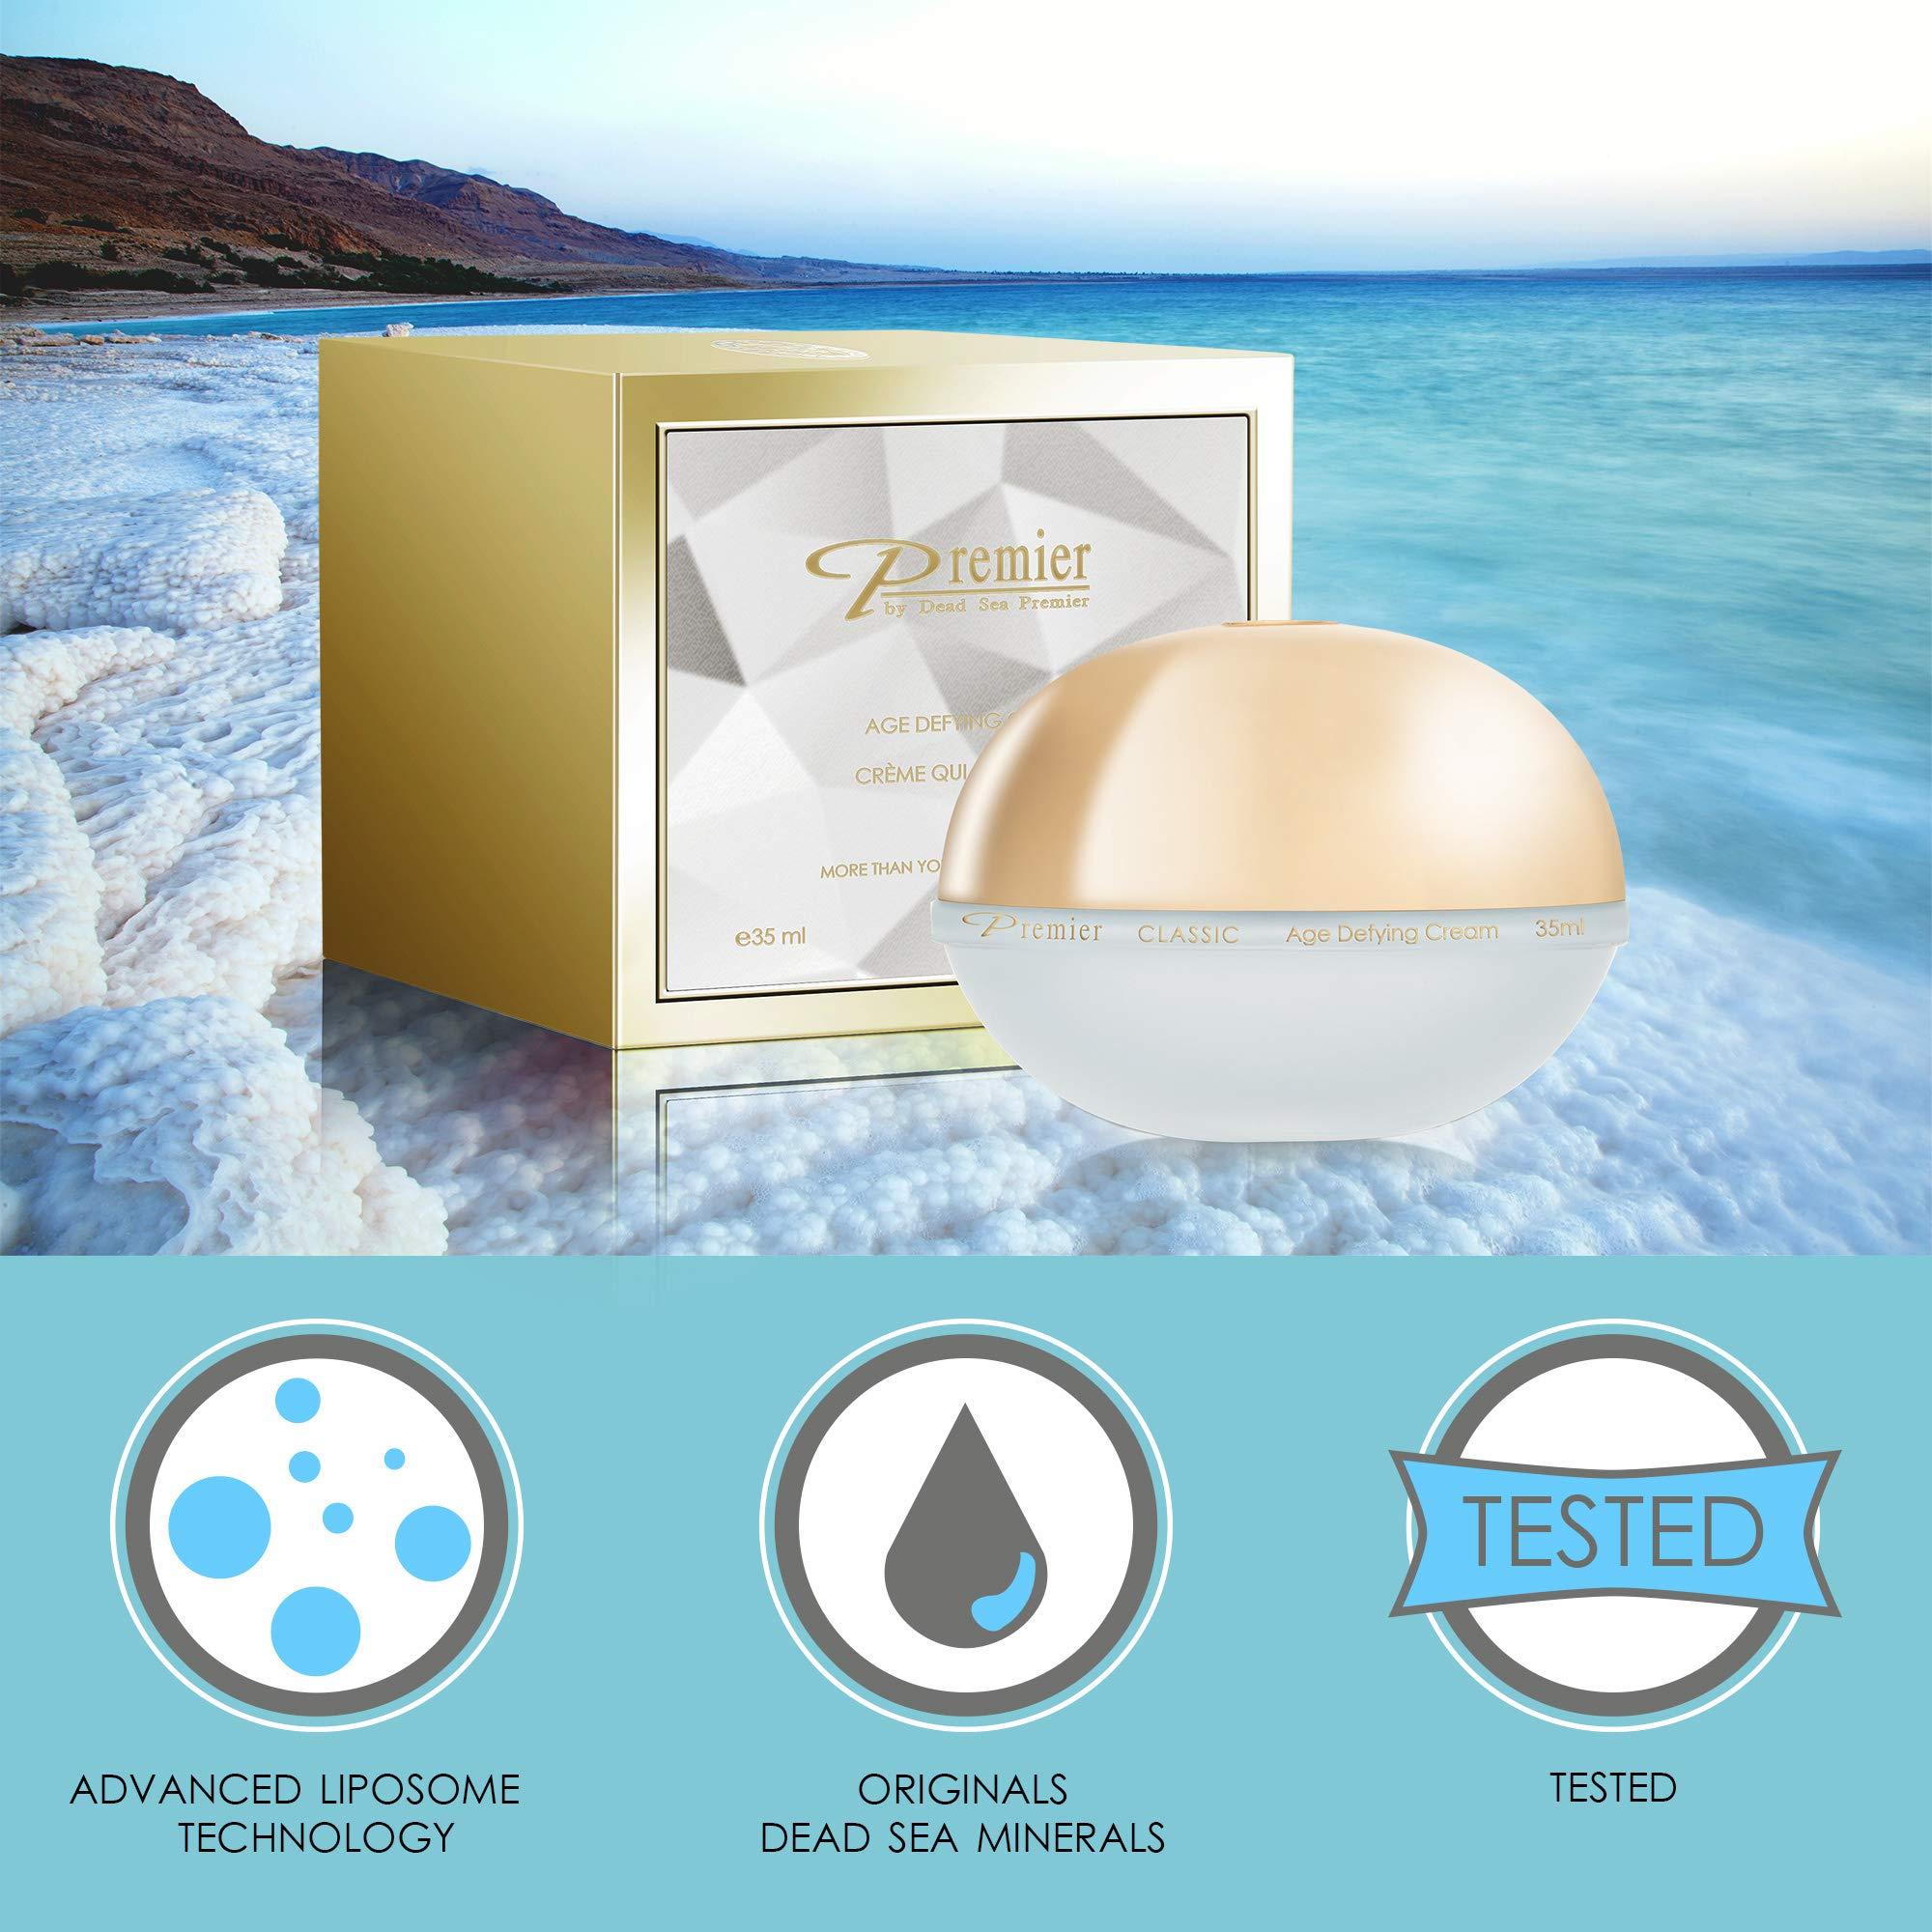 Premier Dead Sea Classic Age Defying Anti Age Cream, Reduce wrinkles by Premier by Dead Sea Premier (Image #3)